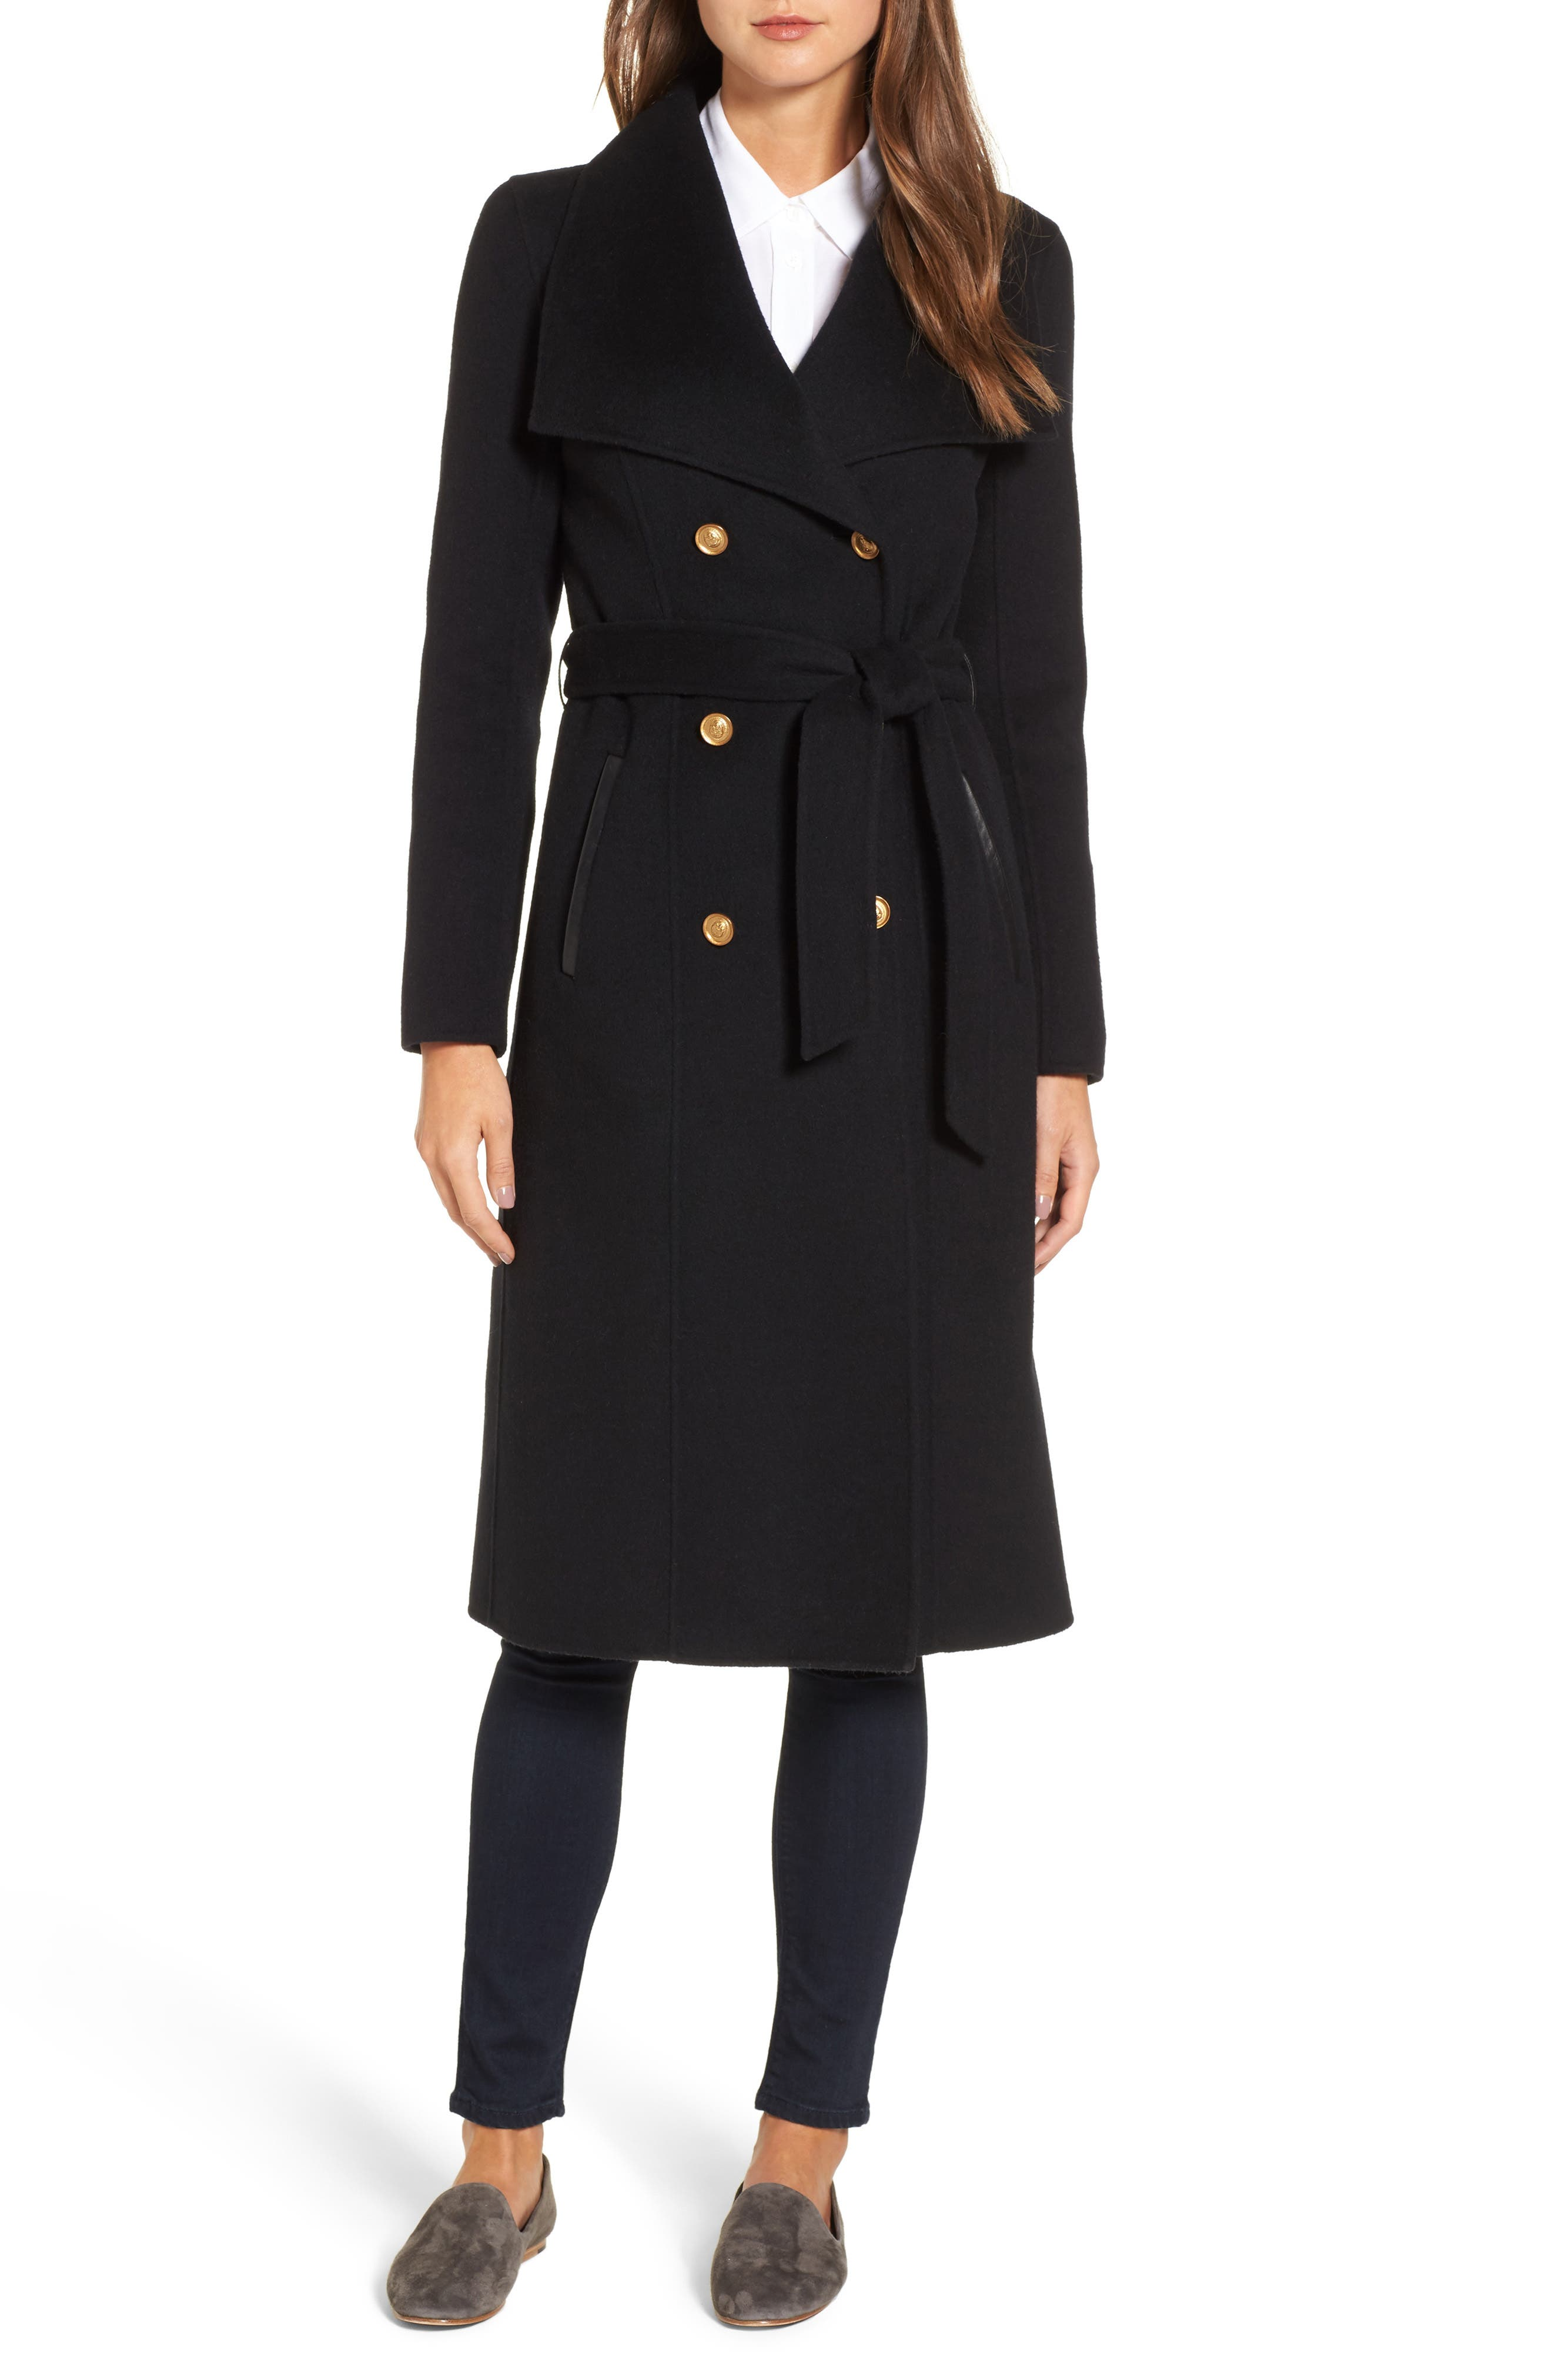 Mackage Norah-N Double Breasted Wool Blend Long Military Coat